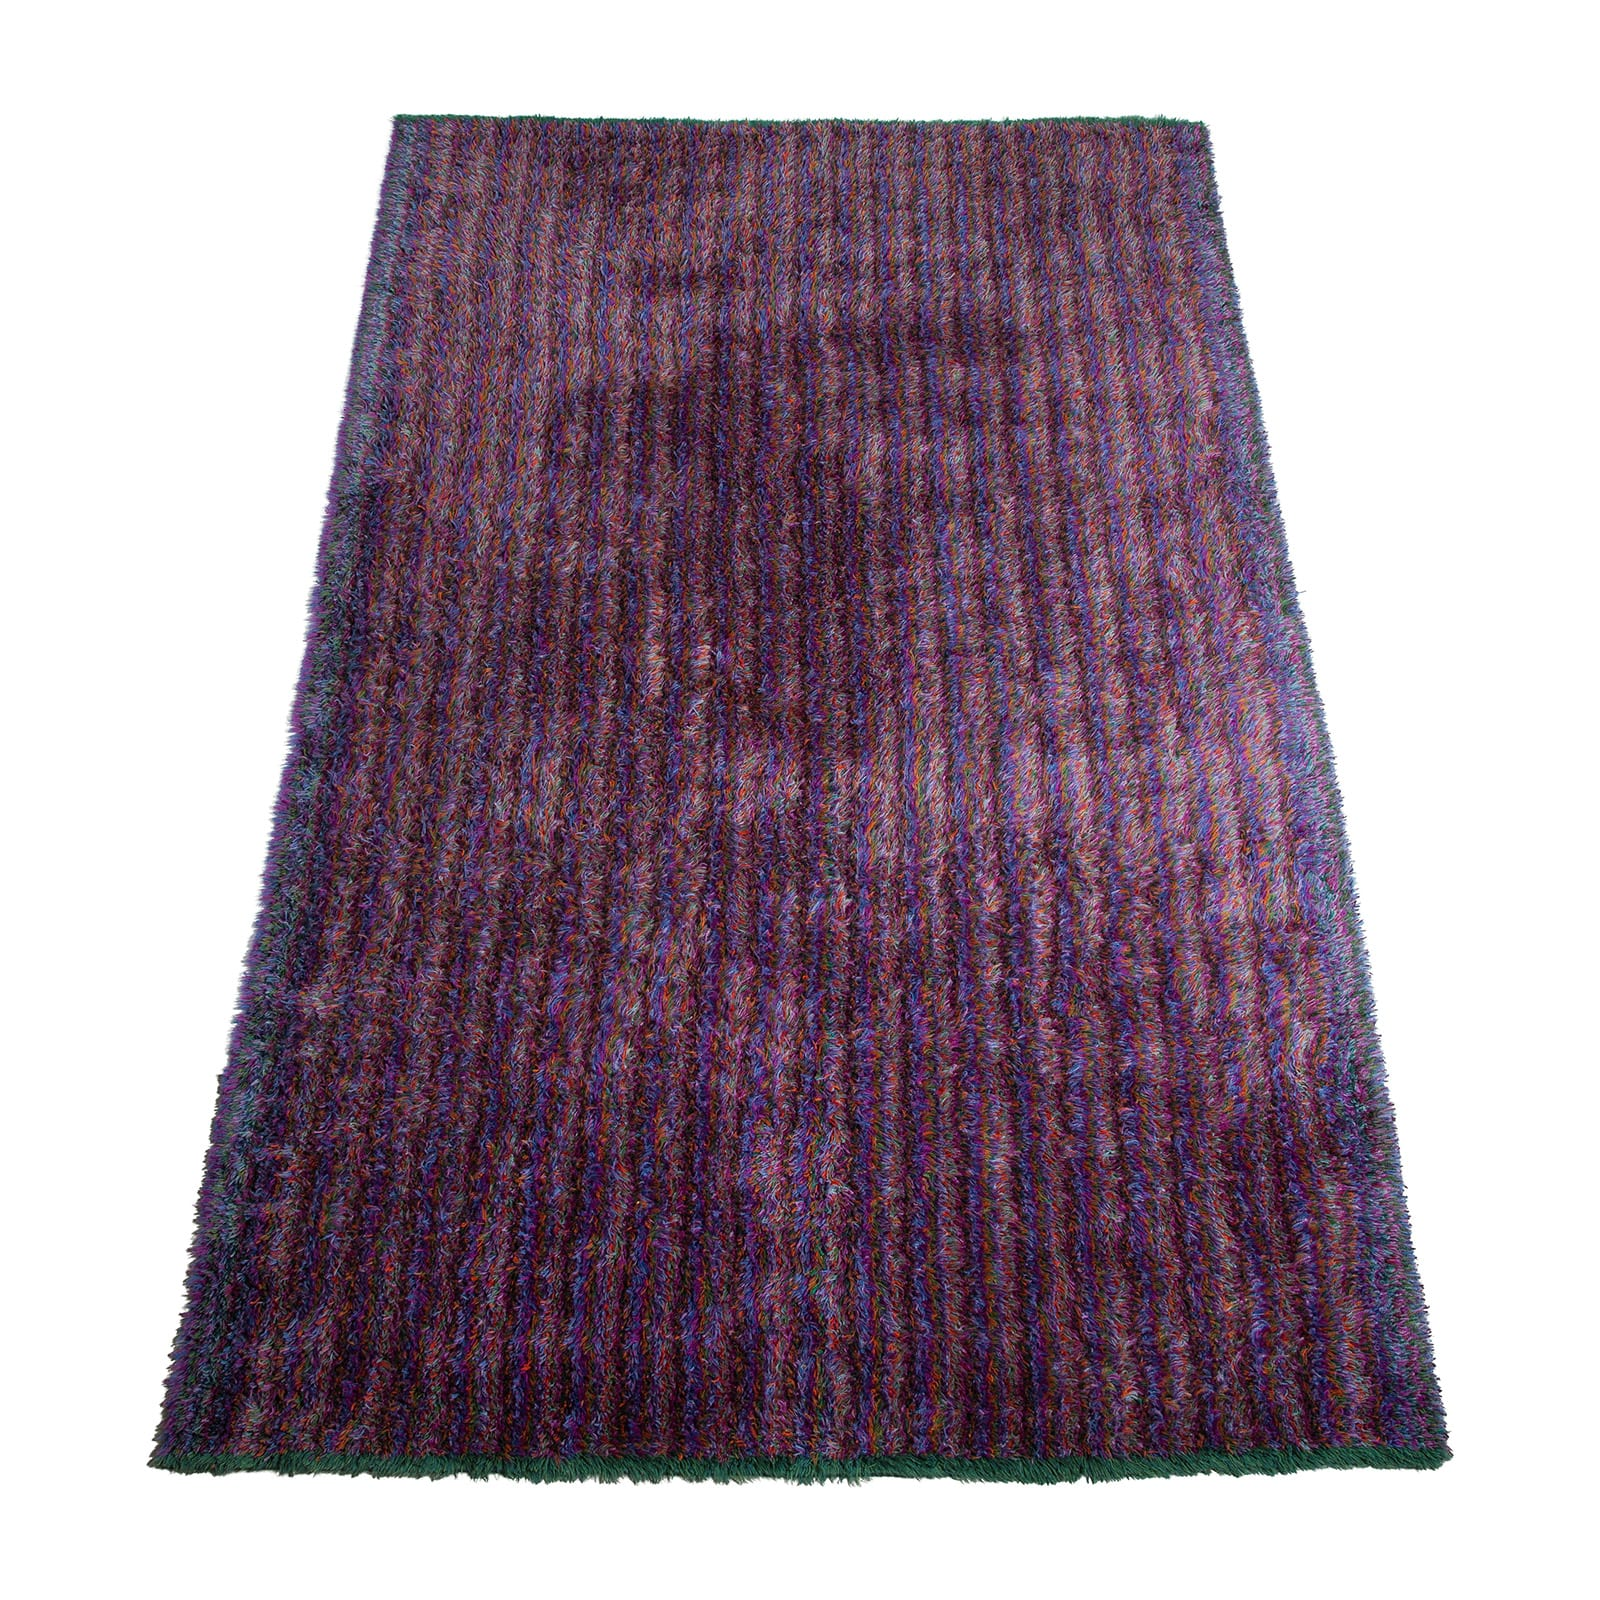 A large rya rug